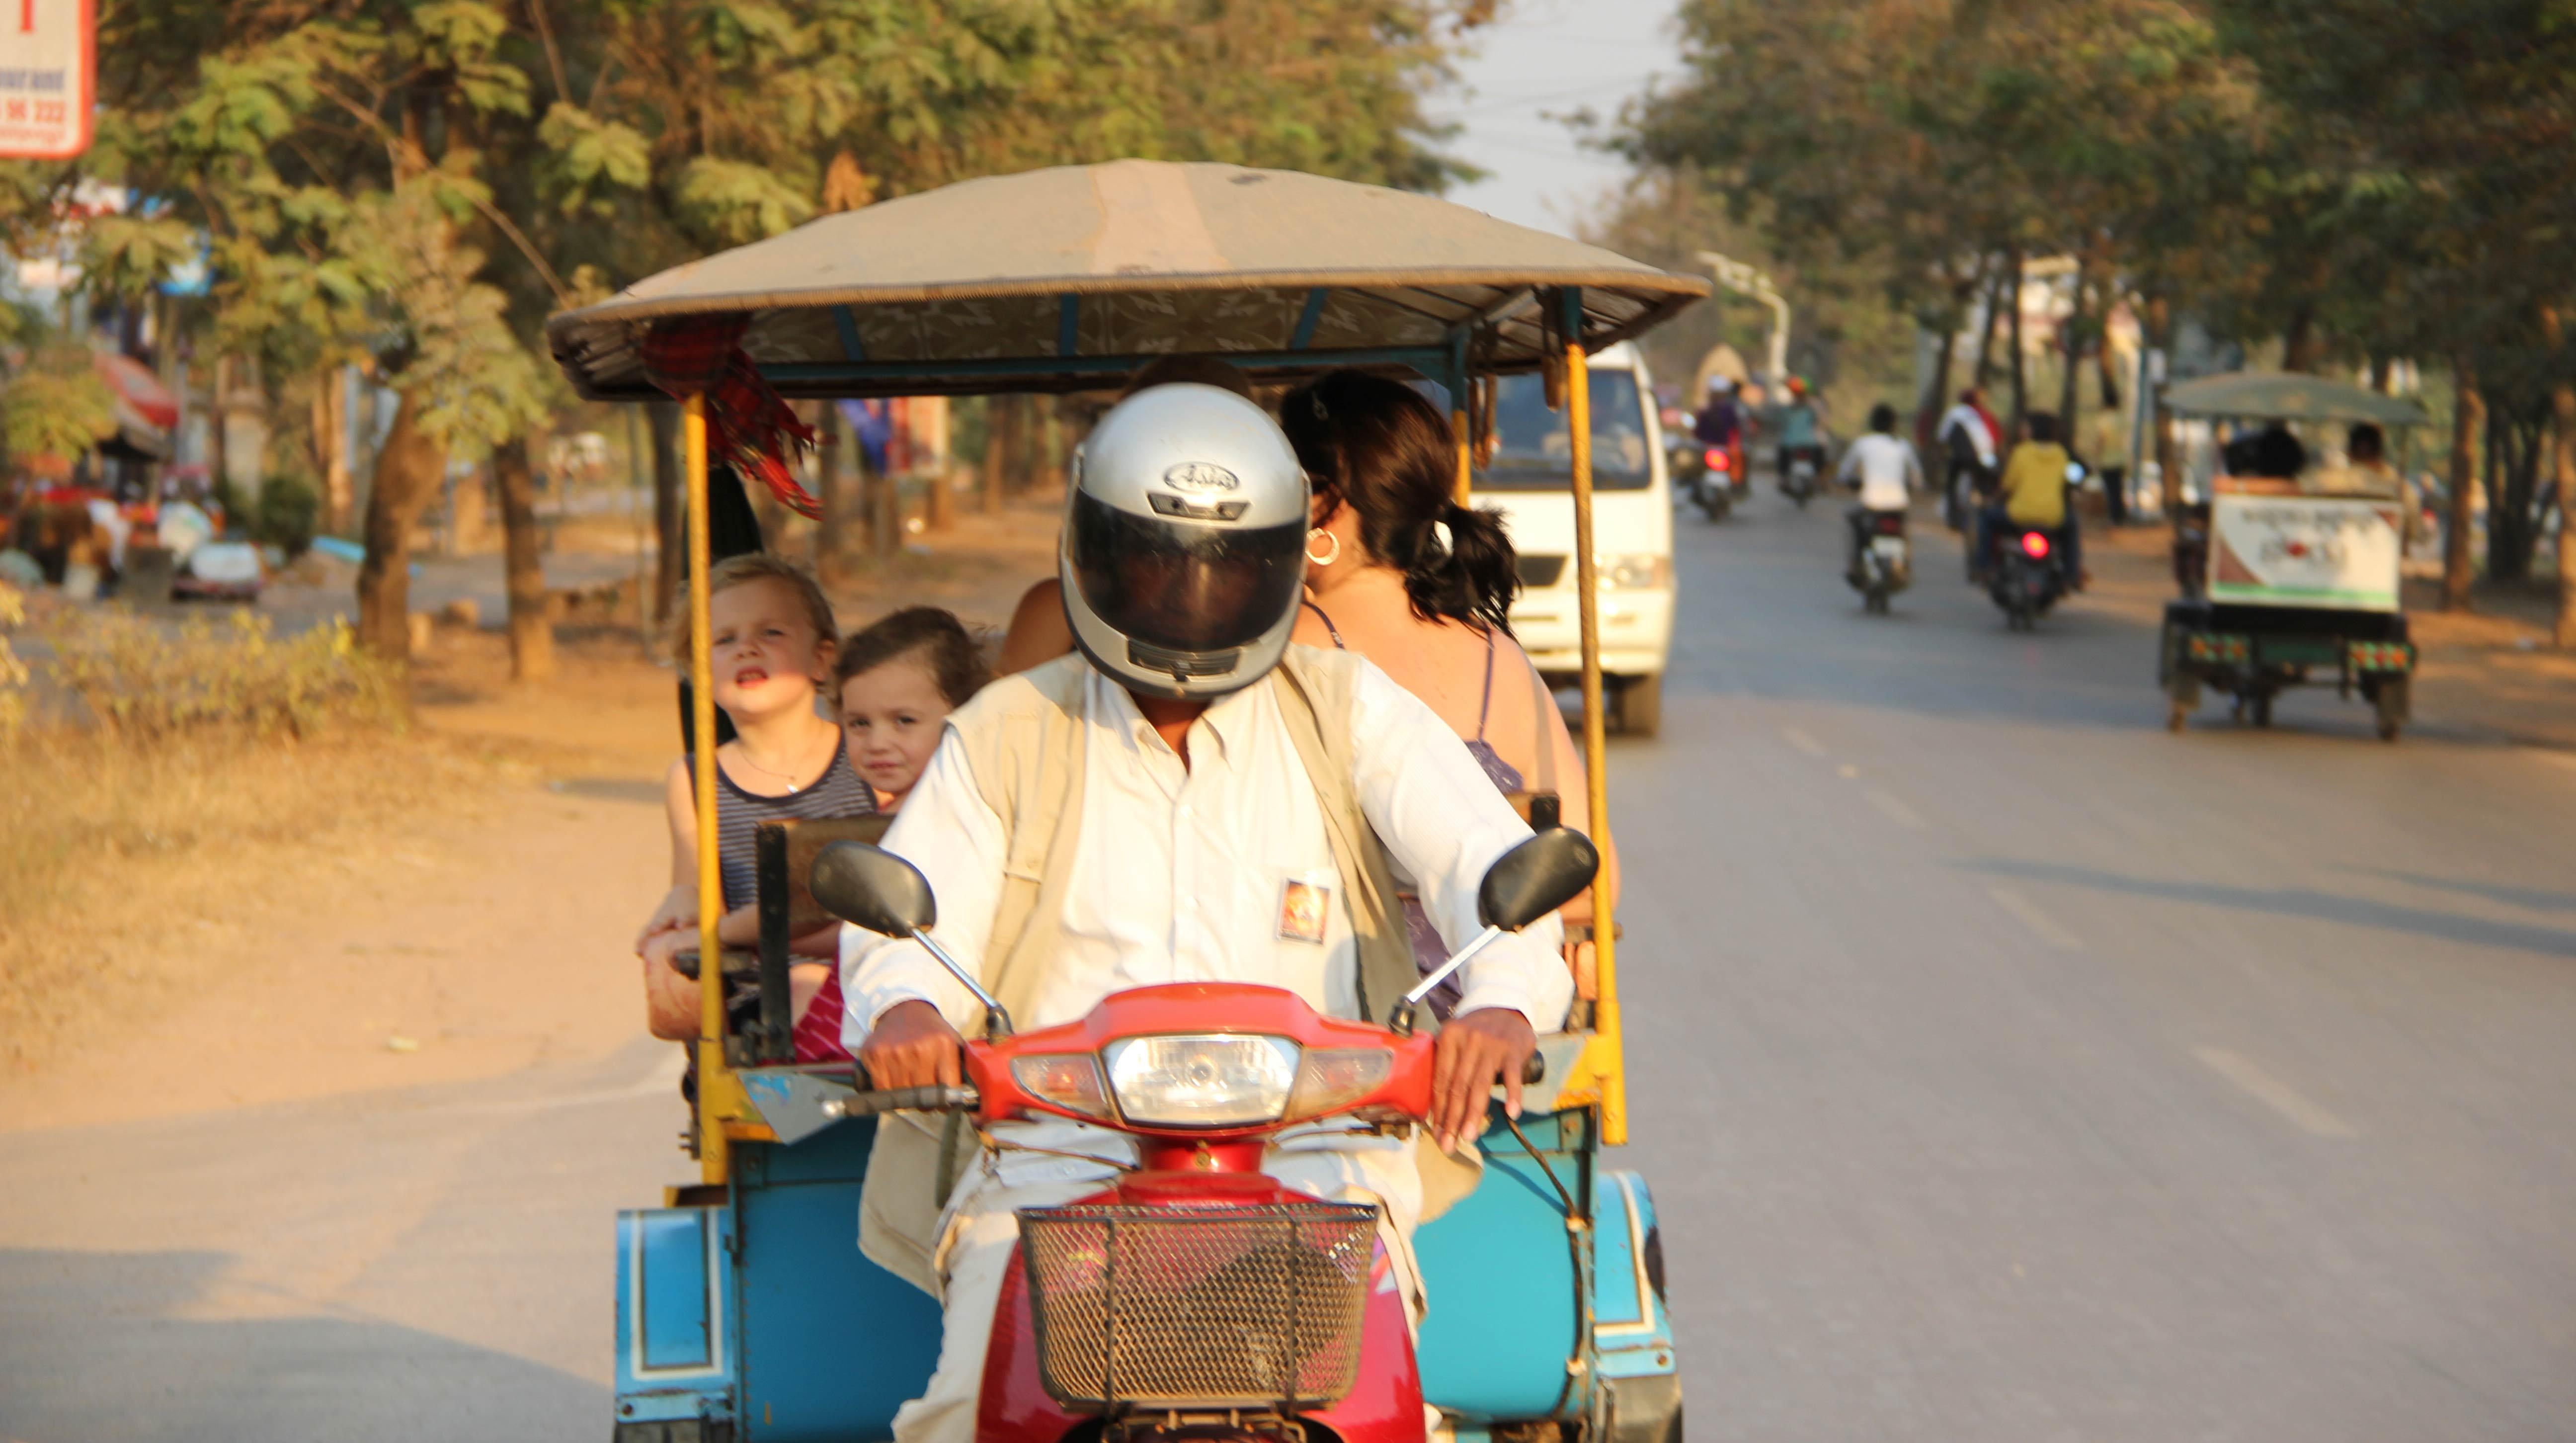 hovedstad i kambodsja pule jenter